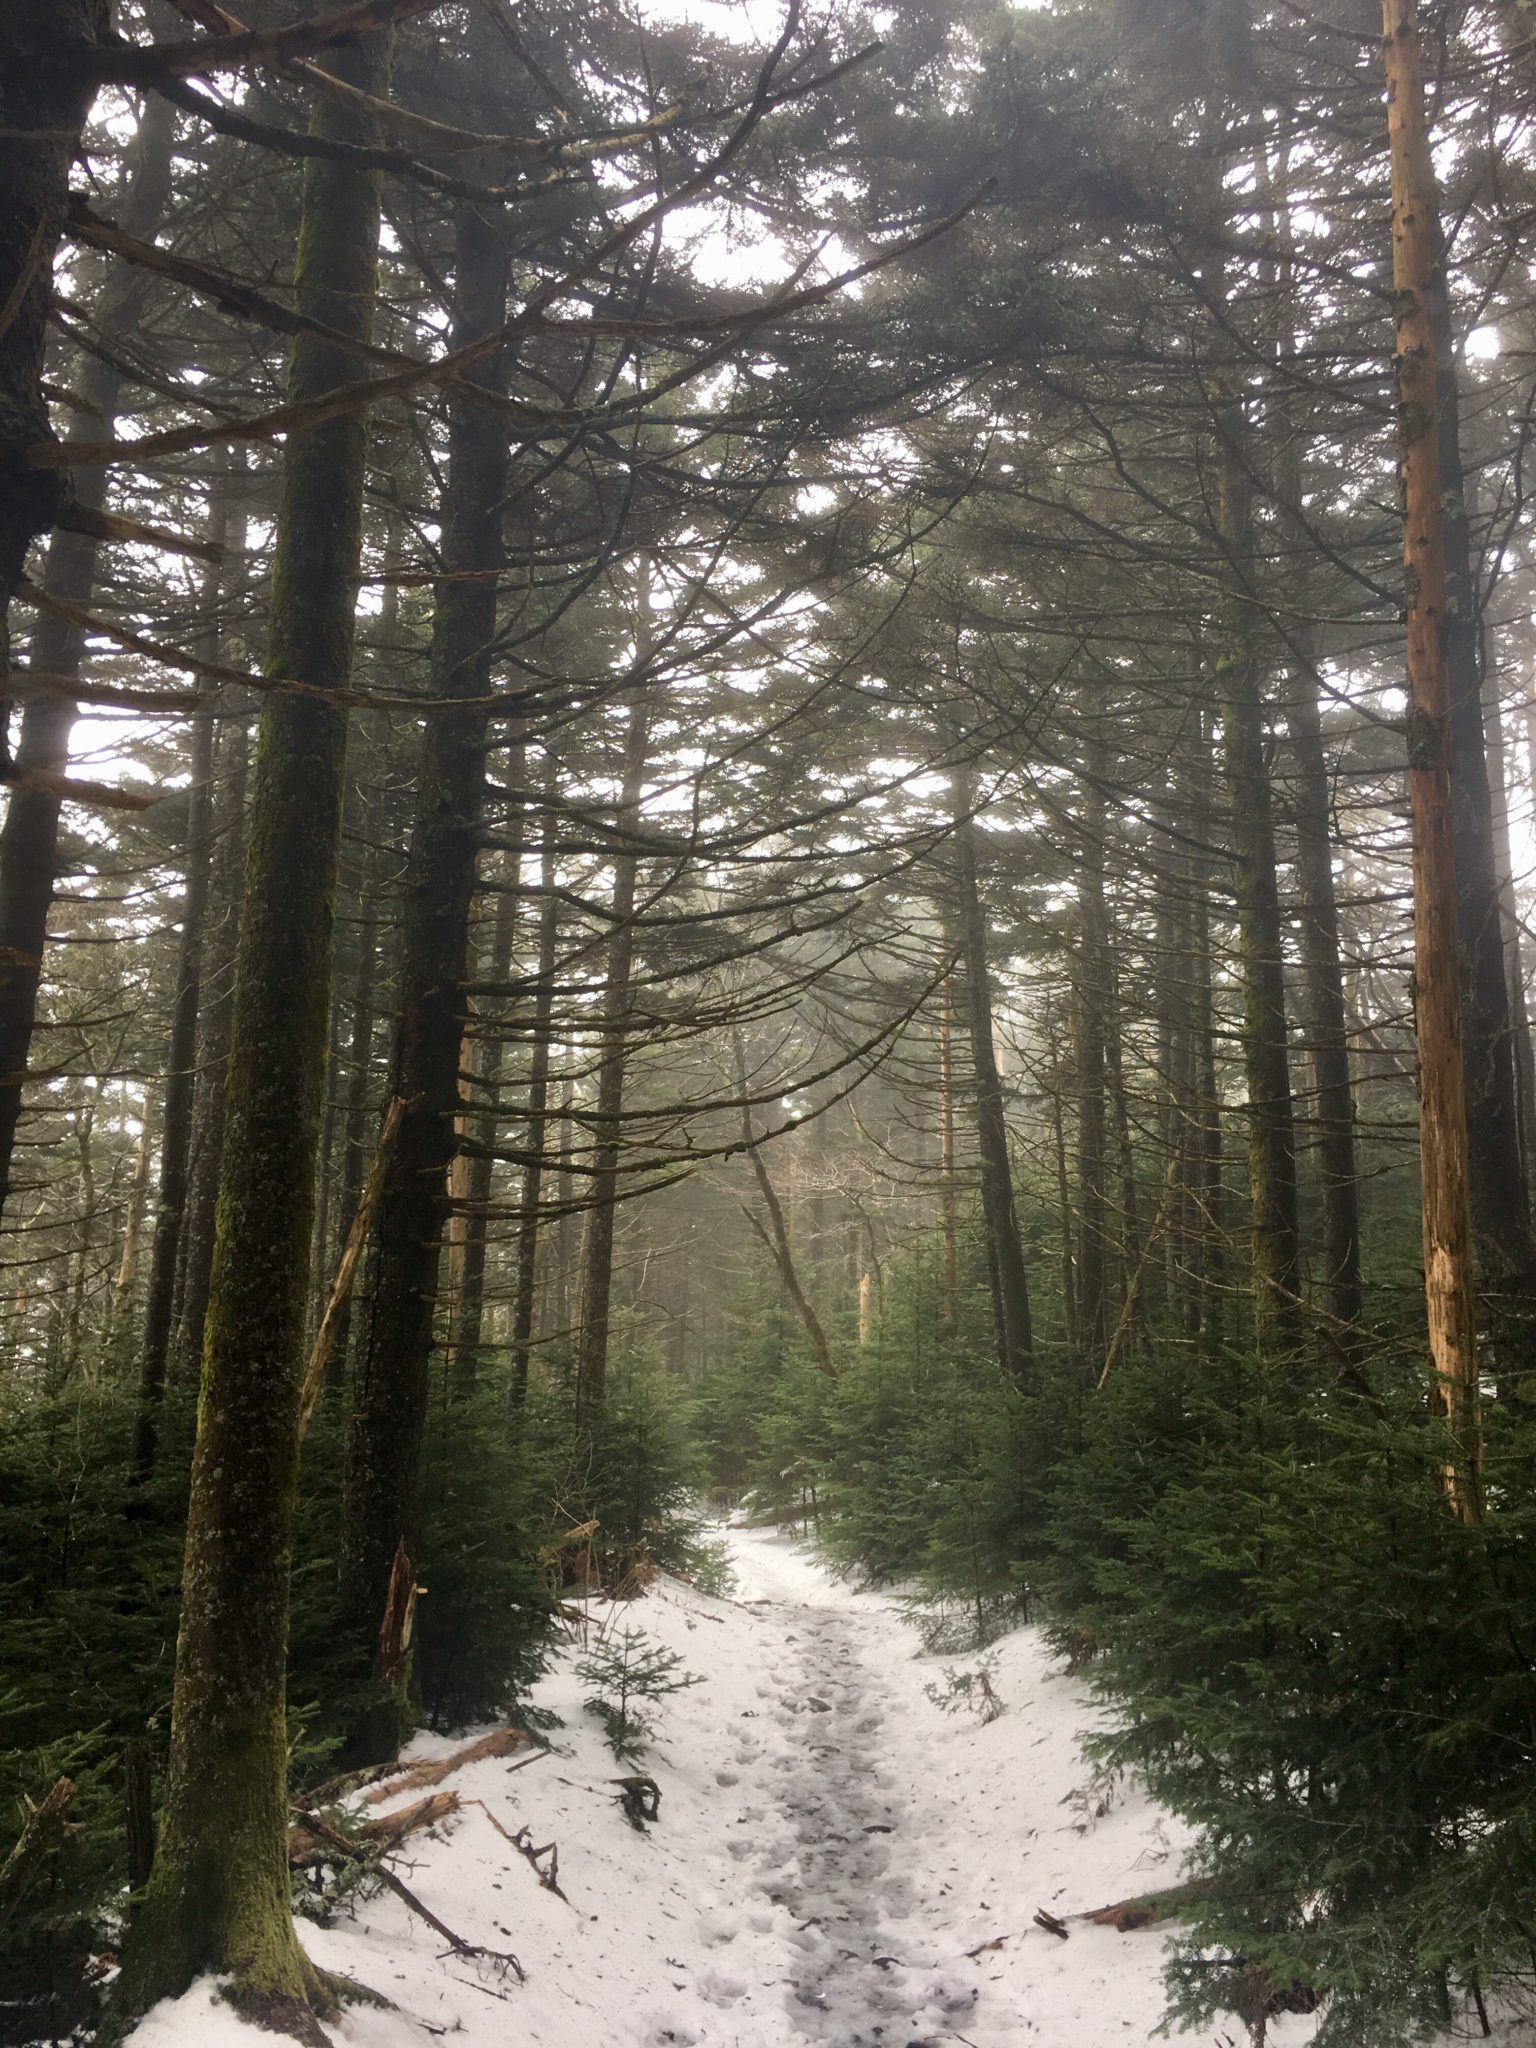 Misty morning on Roan Mountain